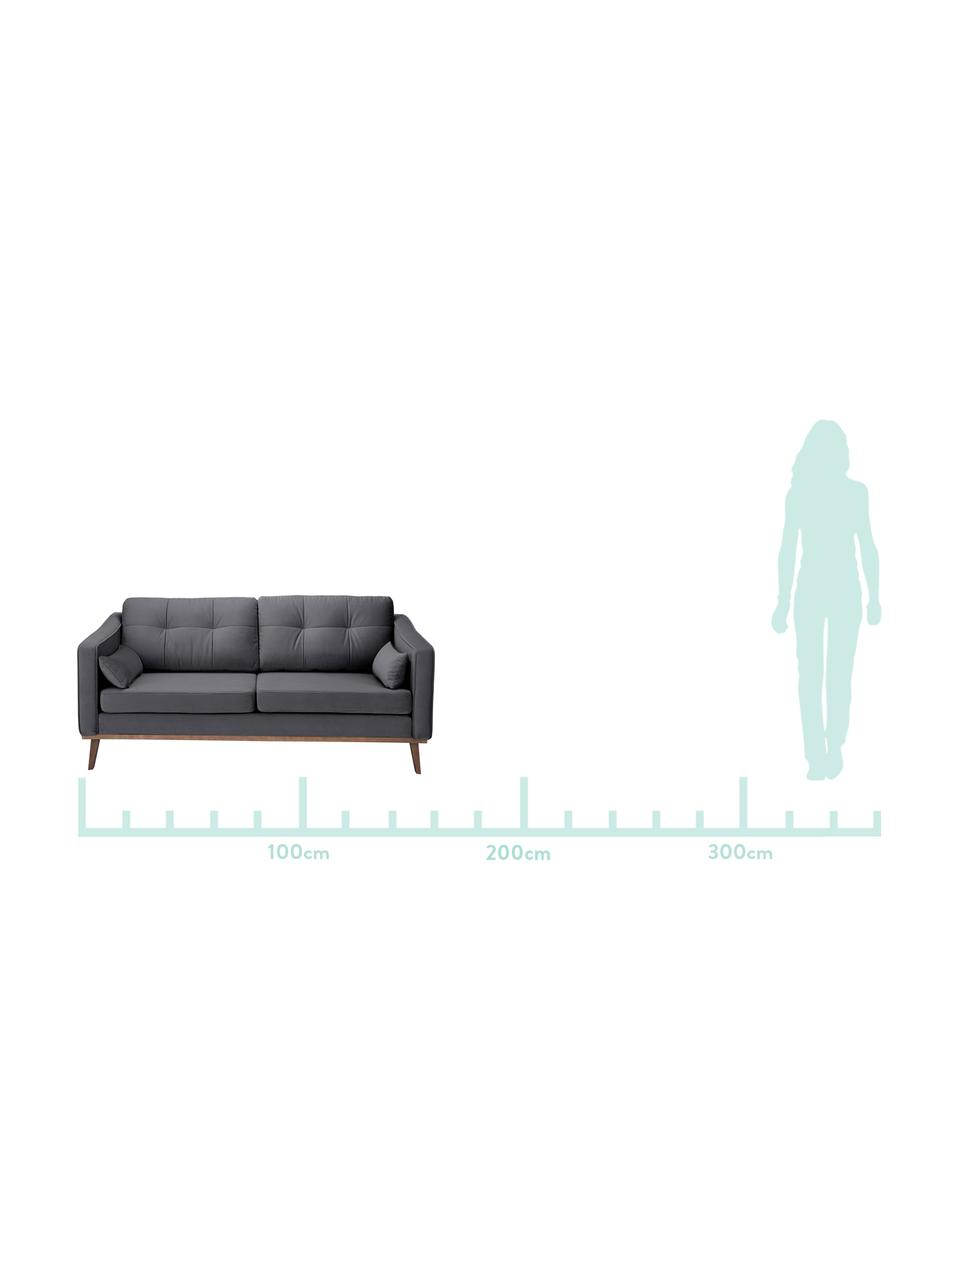 Samt-Sofa Alva (2-Sitzer) in Dunkelgrau mit Holz-Füßen, Bezug: Samt (Hochwertiger Polyes, Gestell: Massives Kiefernholz, Füße: Massives Buchenholz, gebe, Dunkelgrau, B 184x T 94 cm